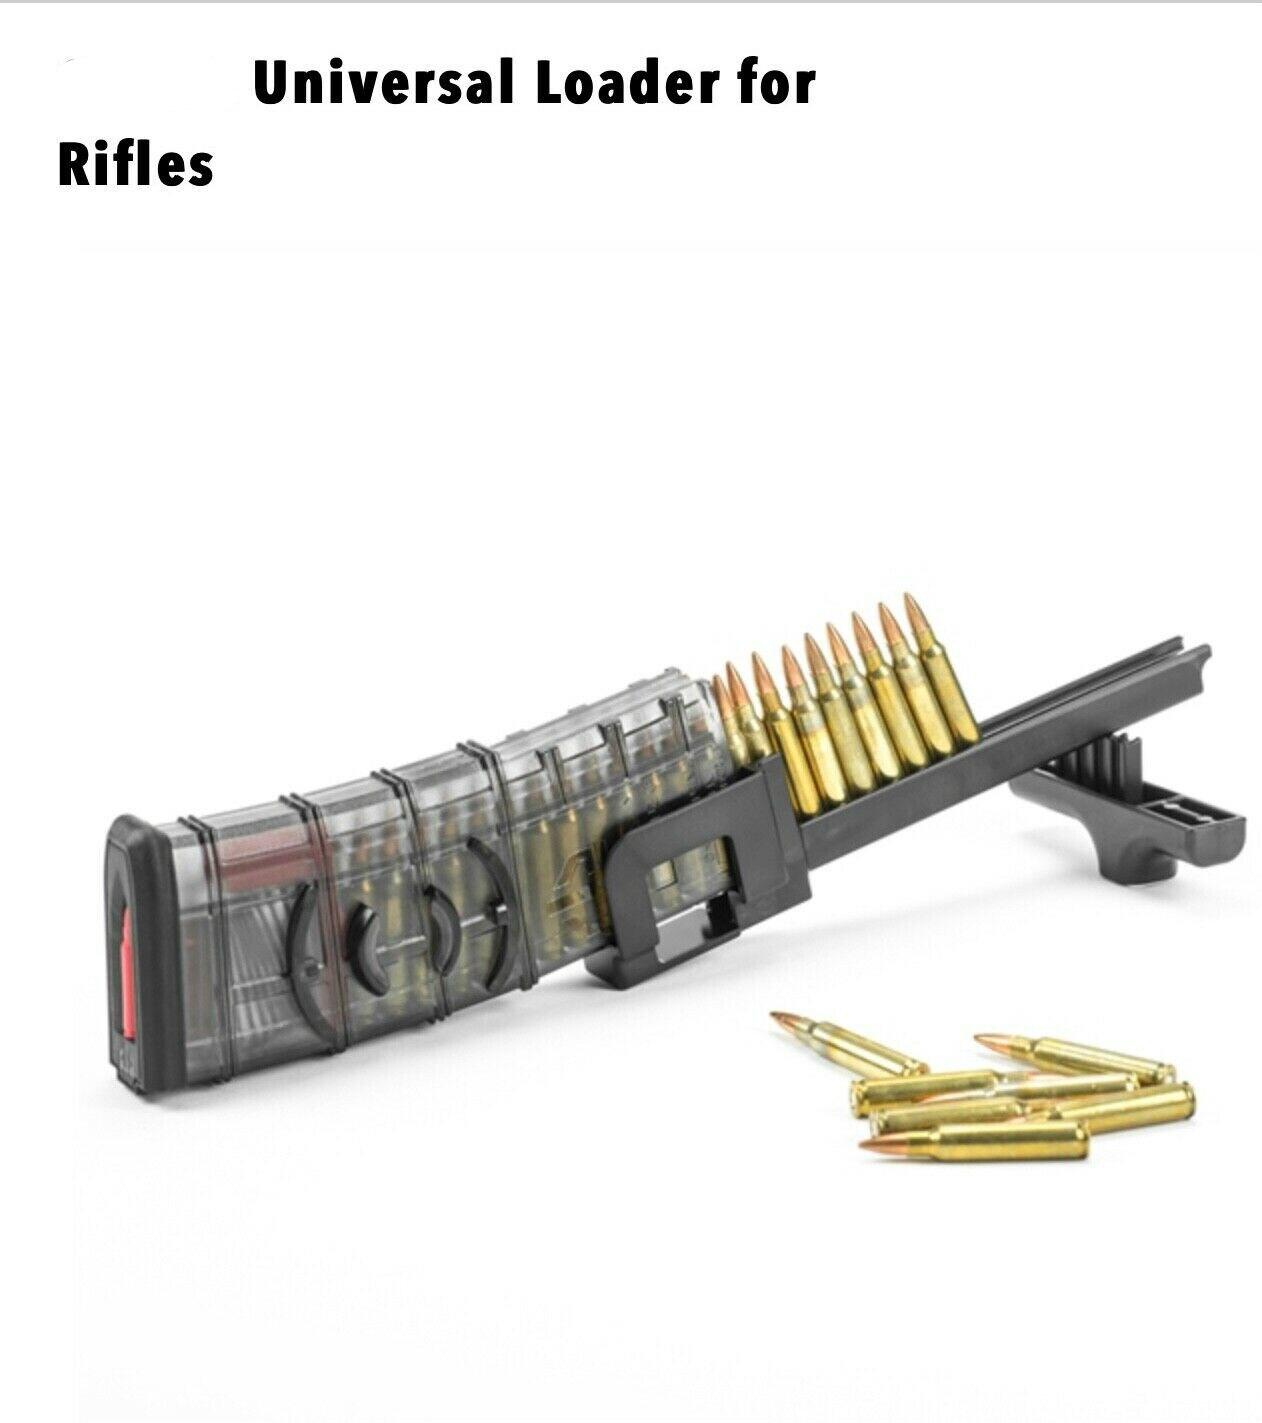 PMAG velocidad cargadora de ruedas Rifle revista Universal 223 5,56, 308 de 7,62x39x5,45x39 x 22LR 22 caza arma Ruger Colt